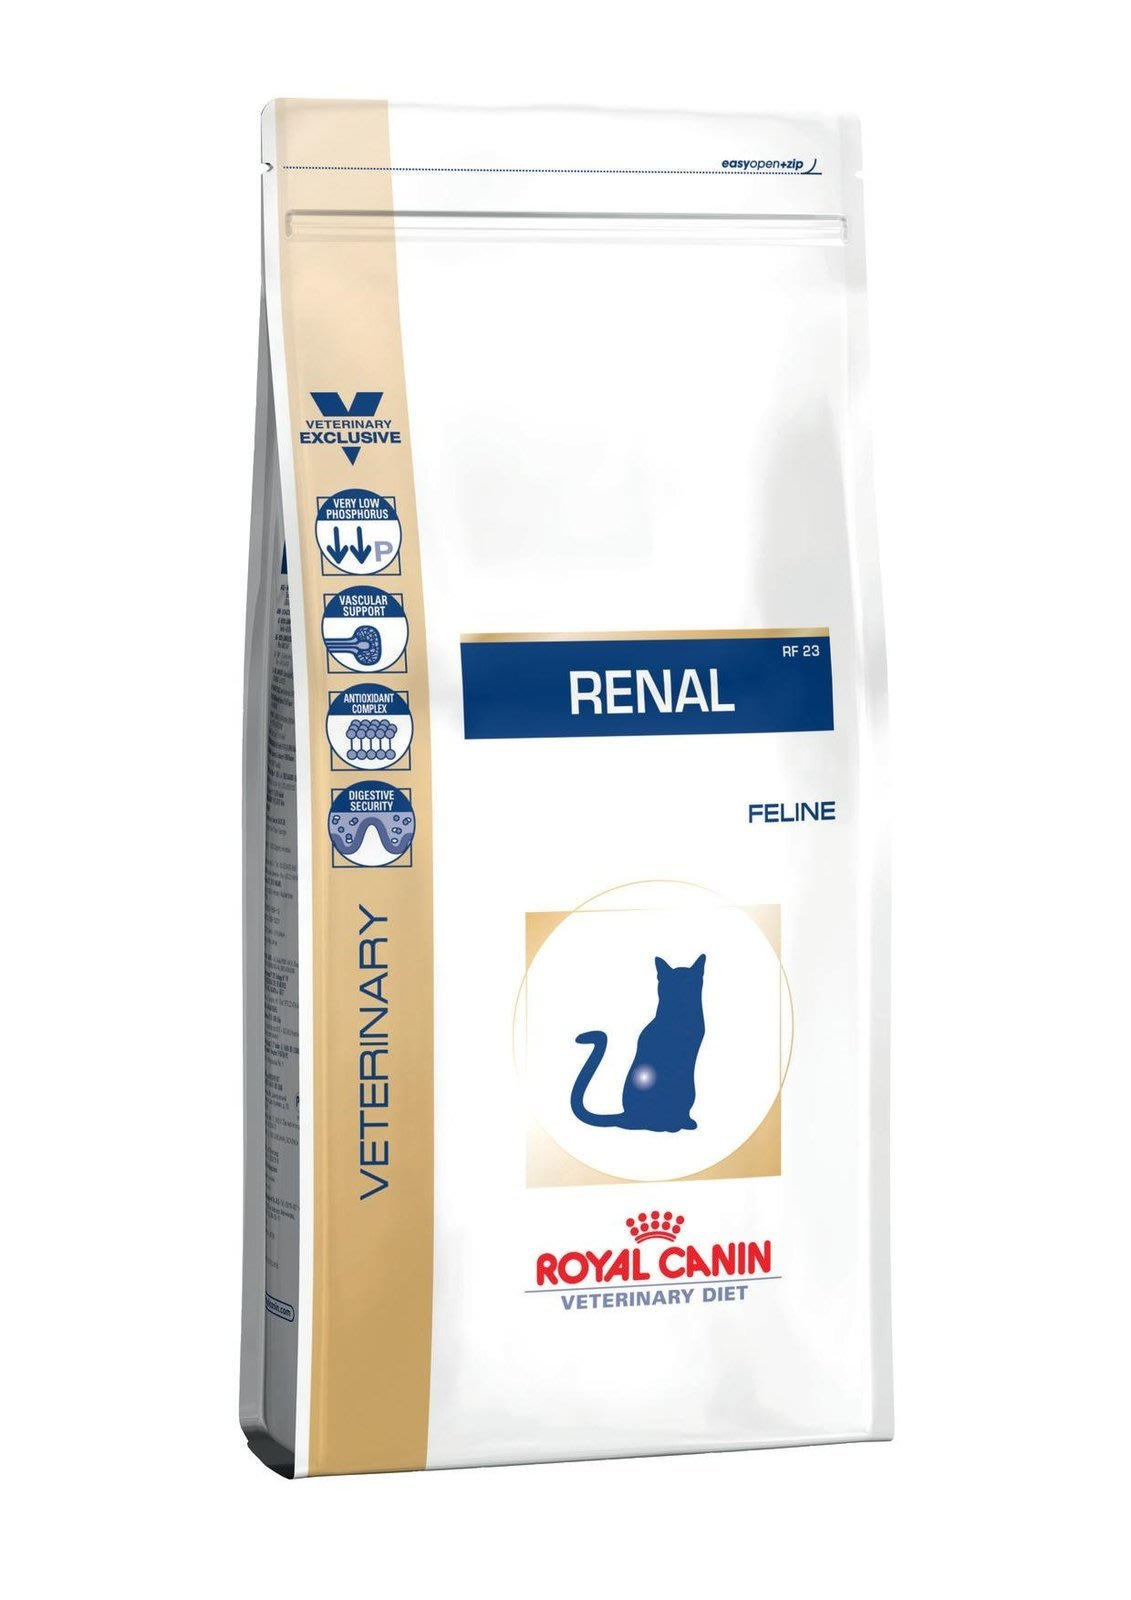 *Crazy Zoo*ROYAL CANIN 法國皇家 RF23貓腎臟處方飼料 4KG